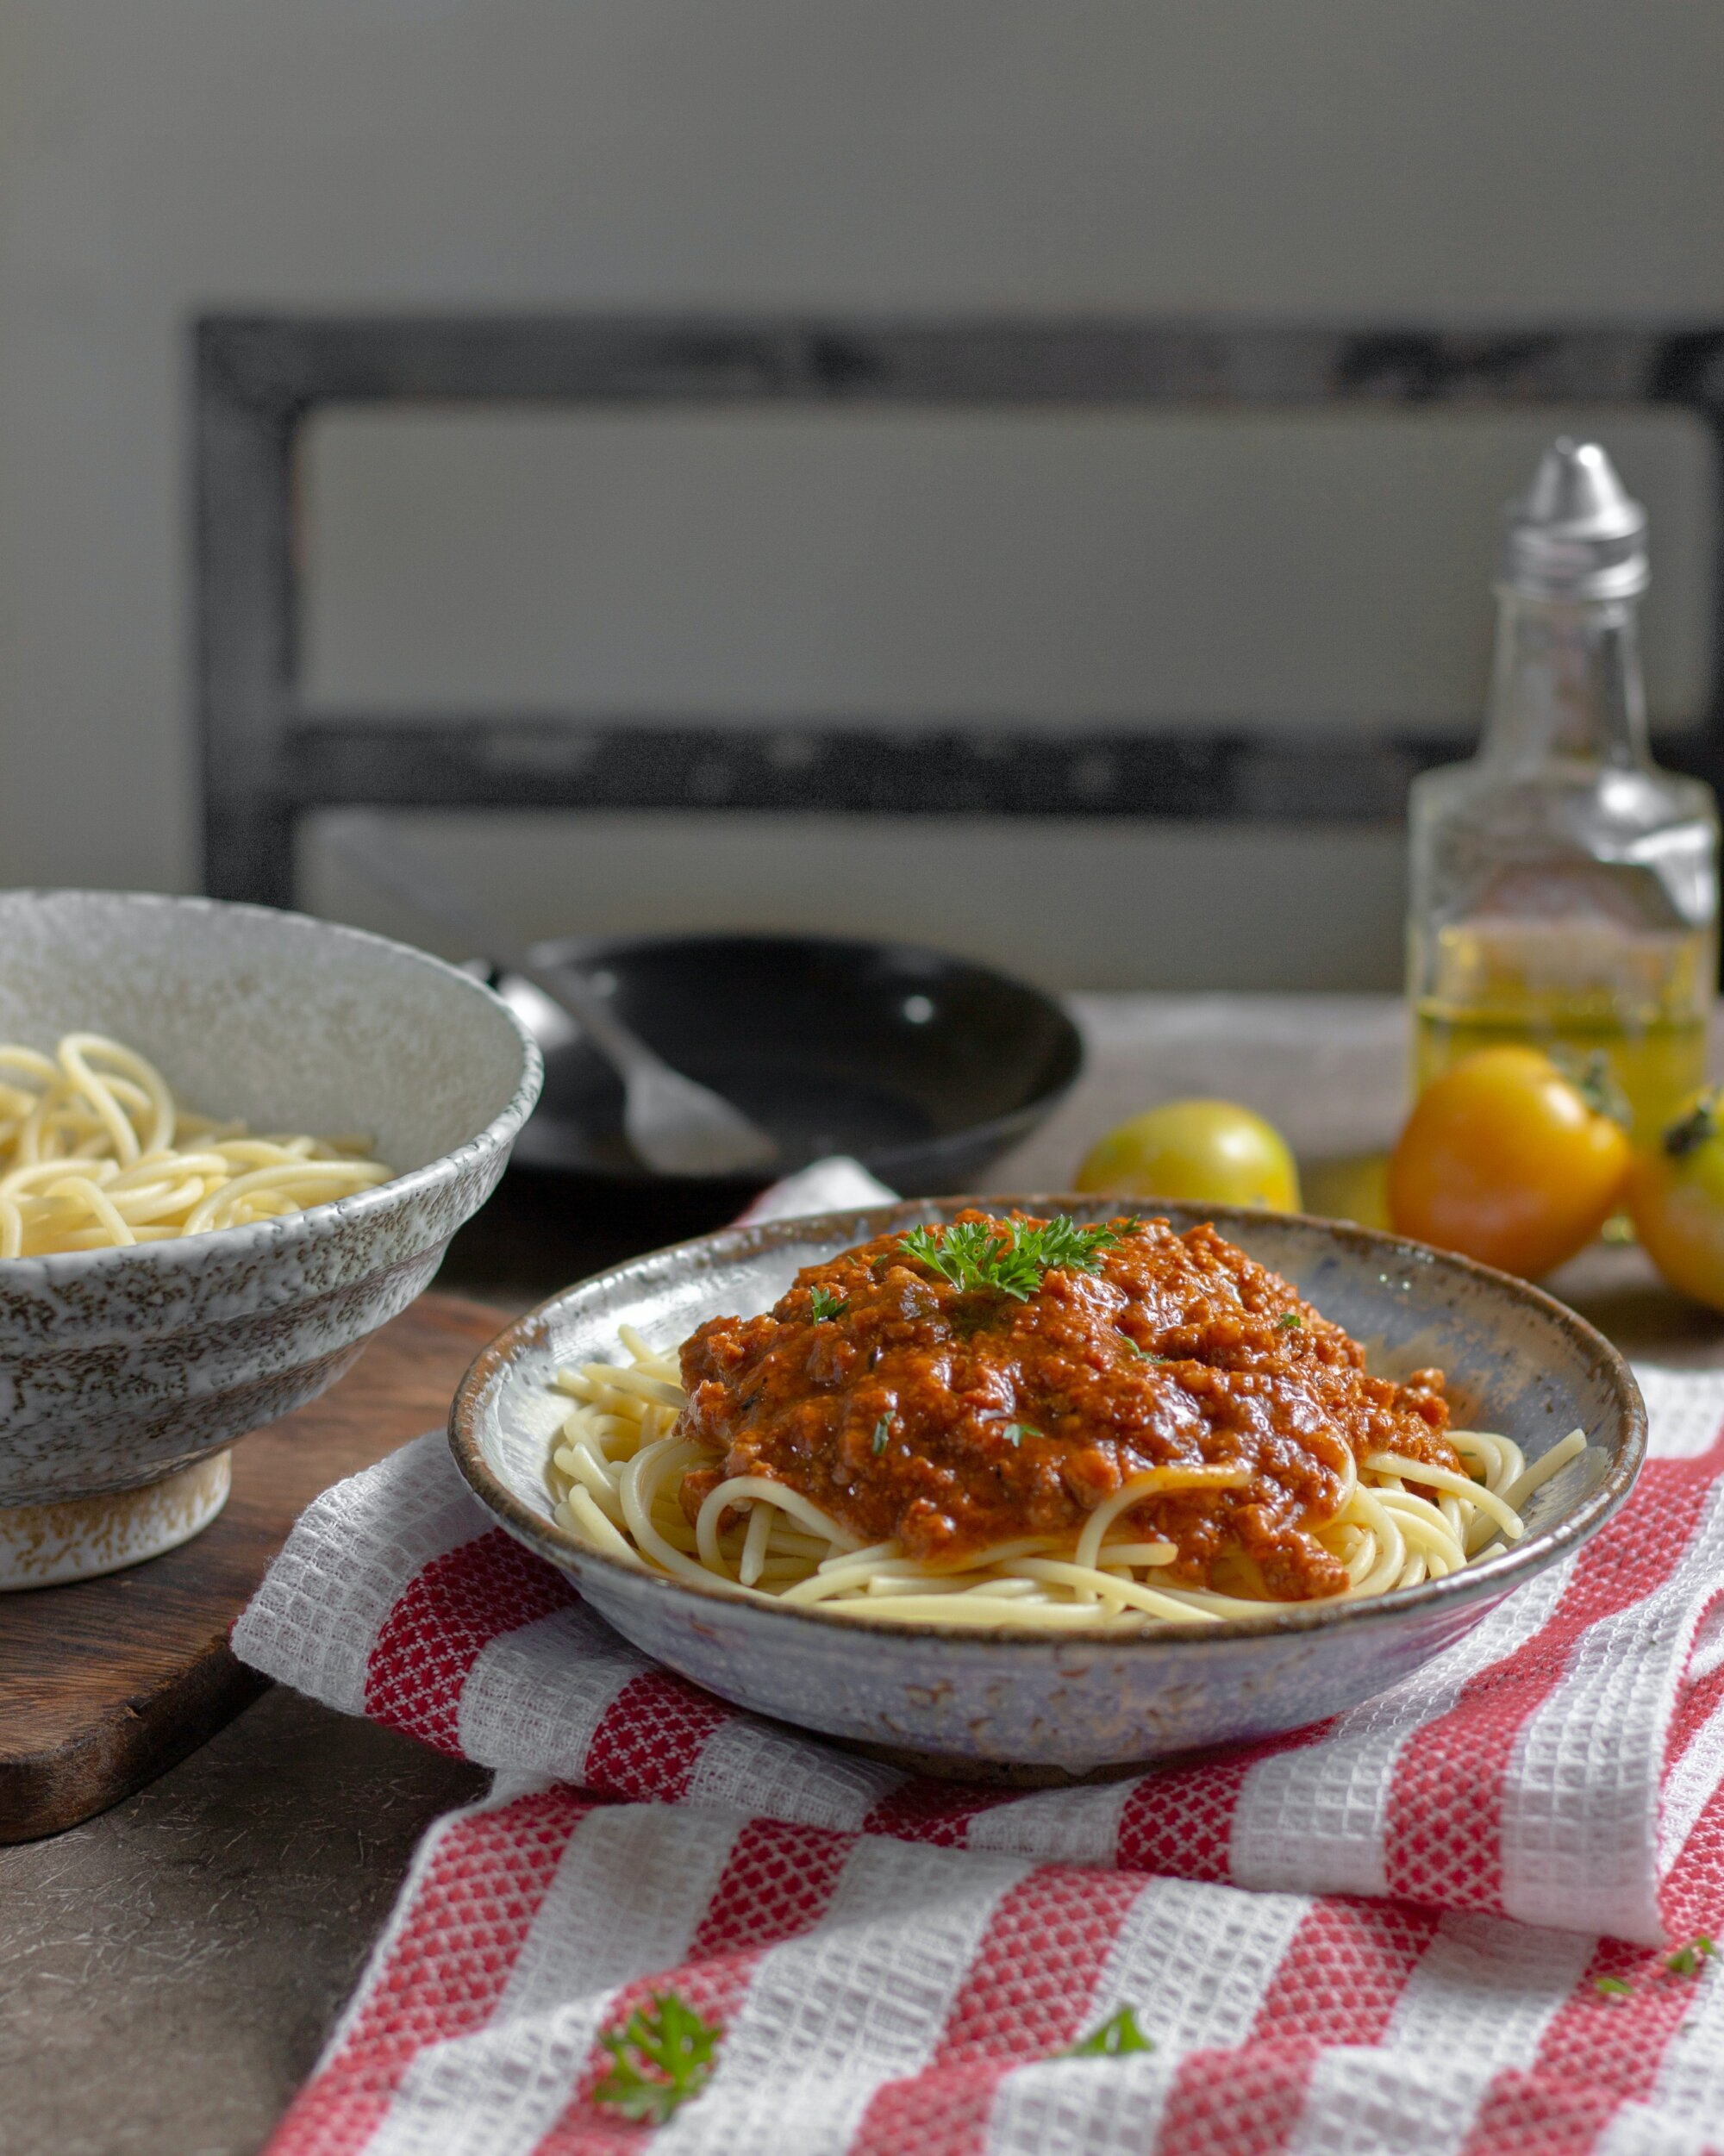 Keukenmedewerker (vast/flexi) – Sport- en cultuurbar Uytcafe (Lochristi)